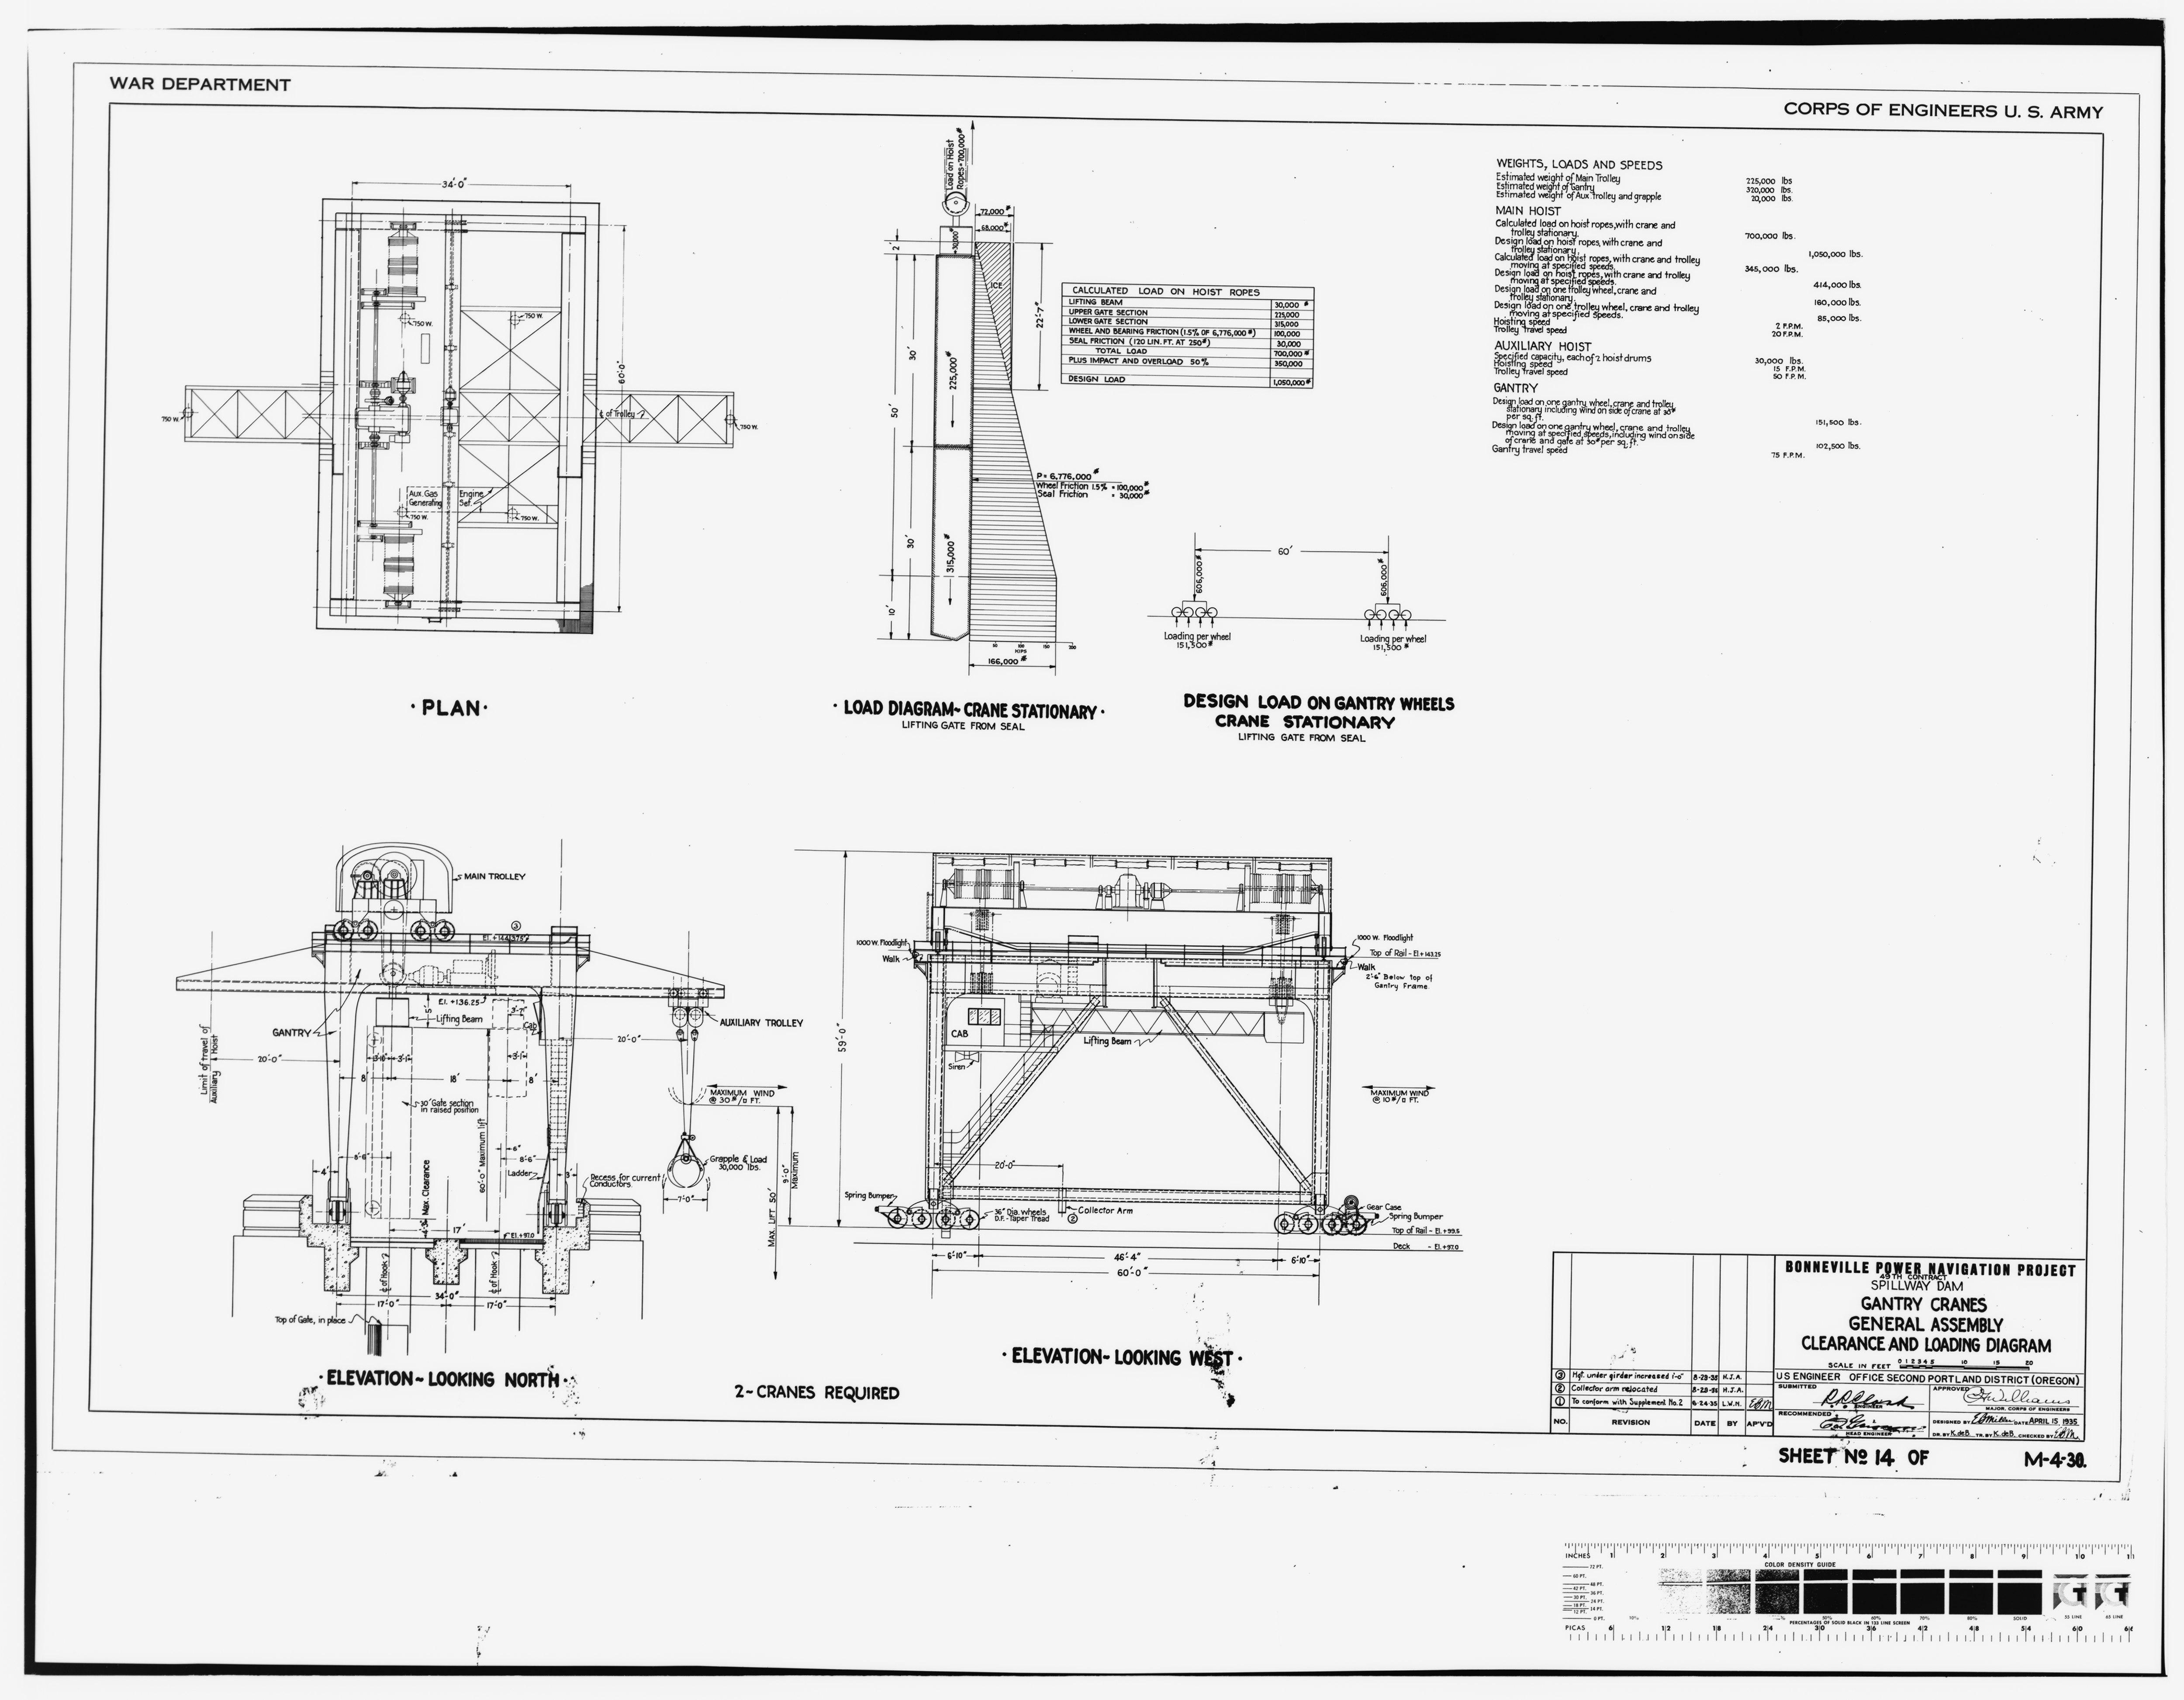 File Photocopy Of Original Construction Drawing 15 April